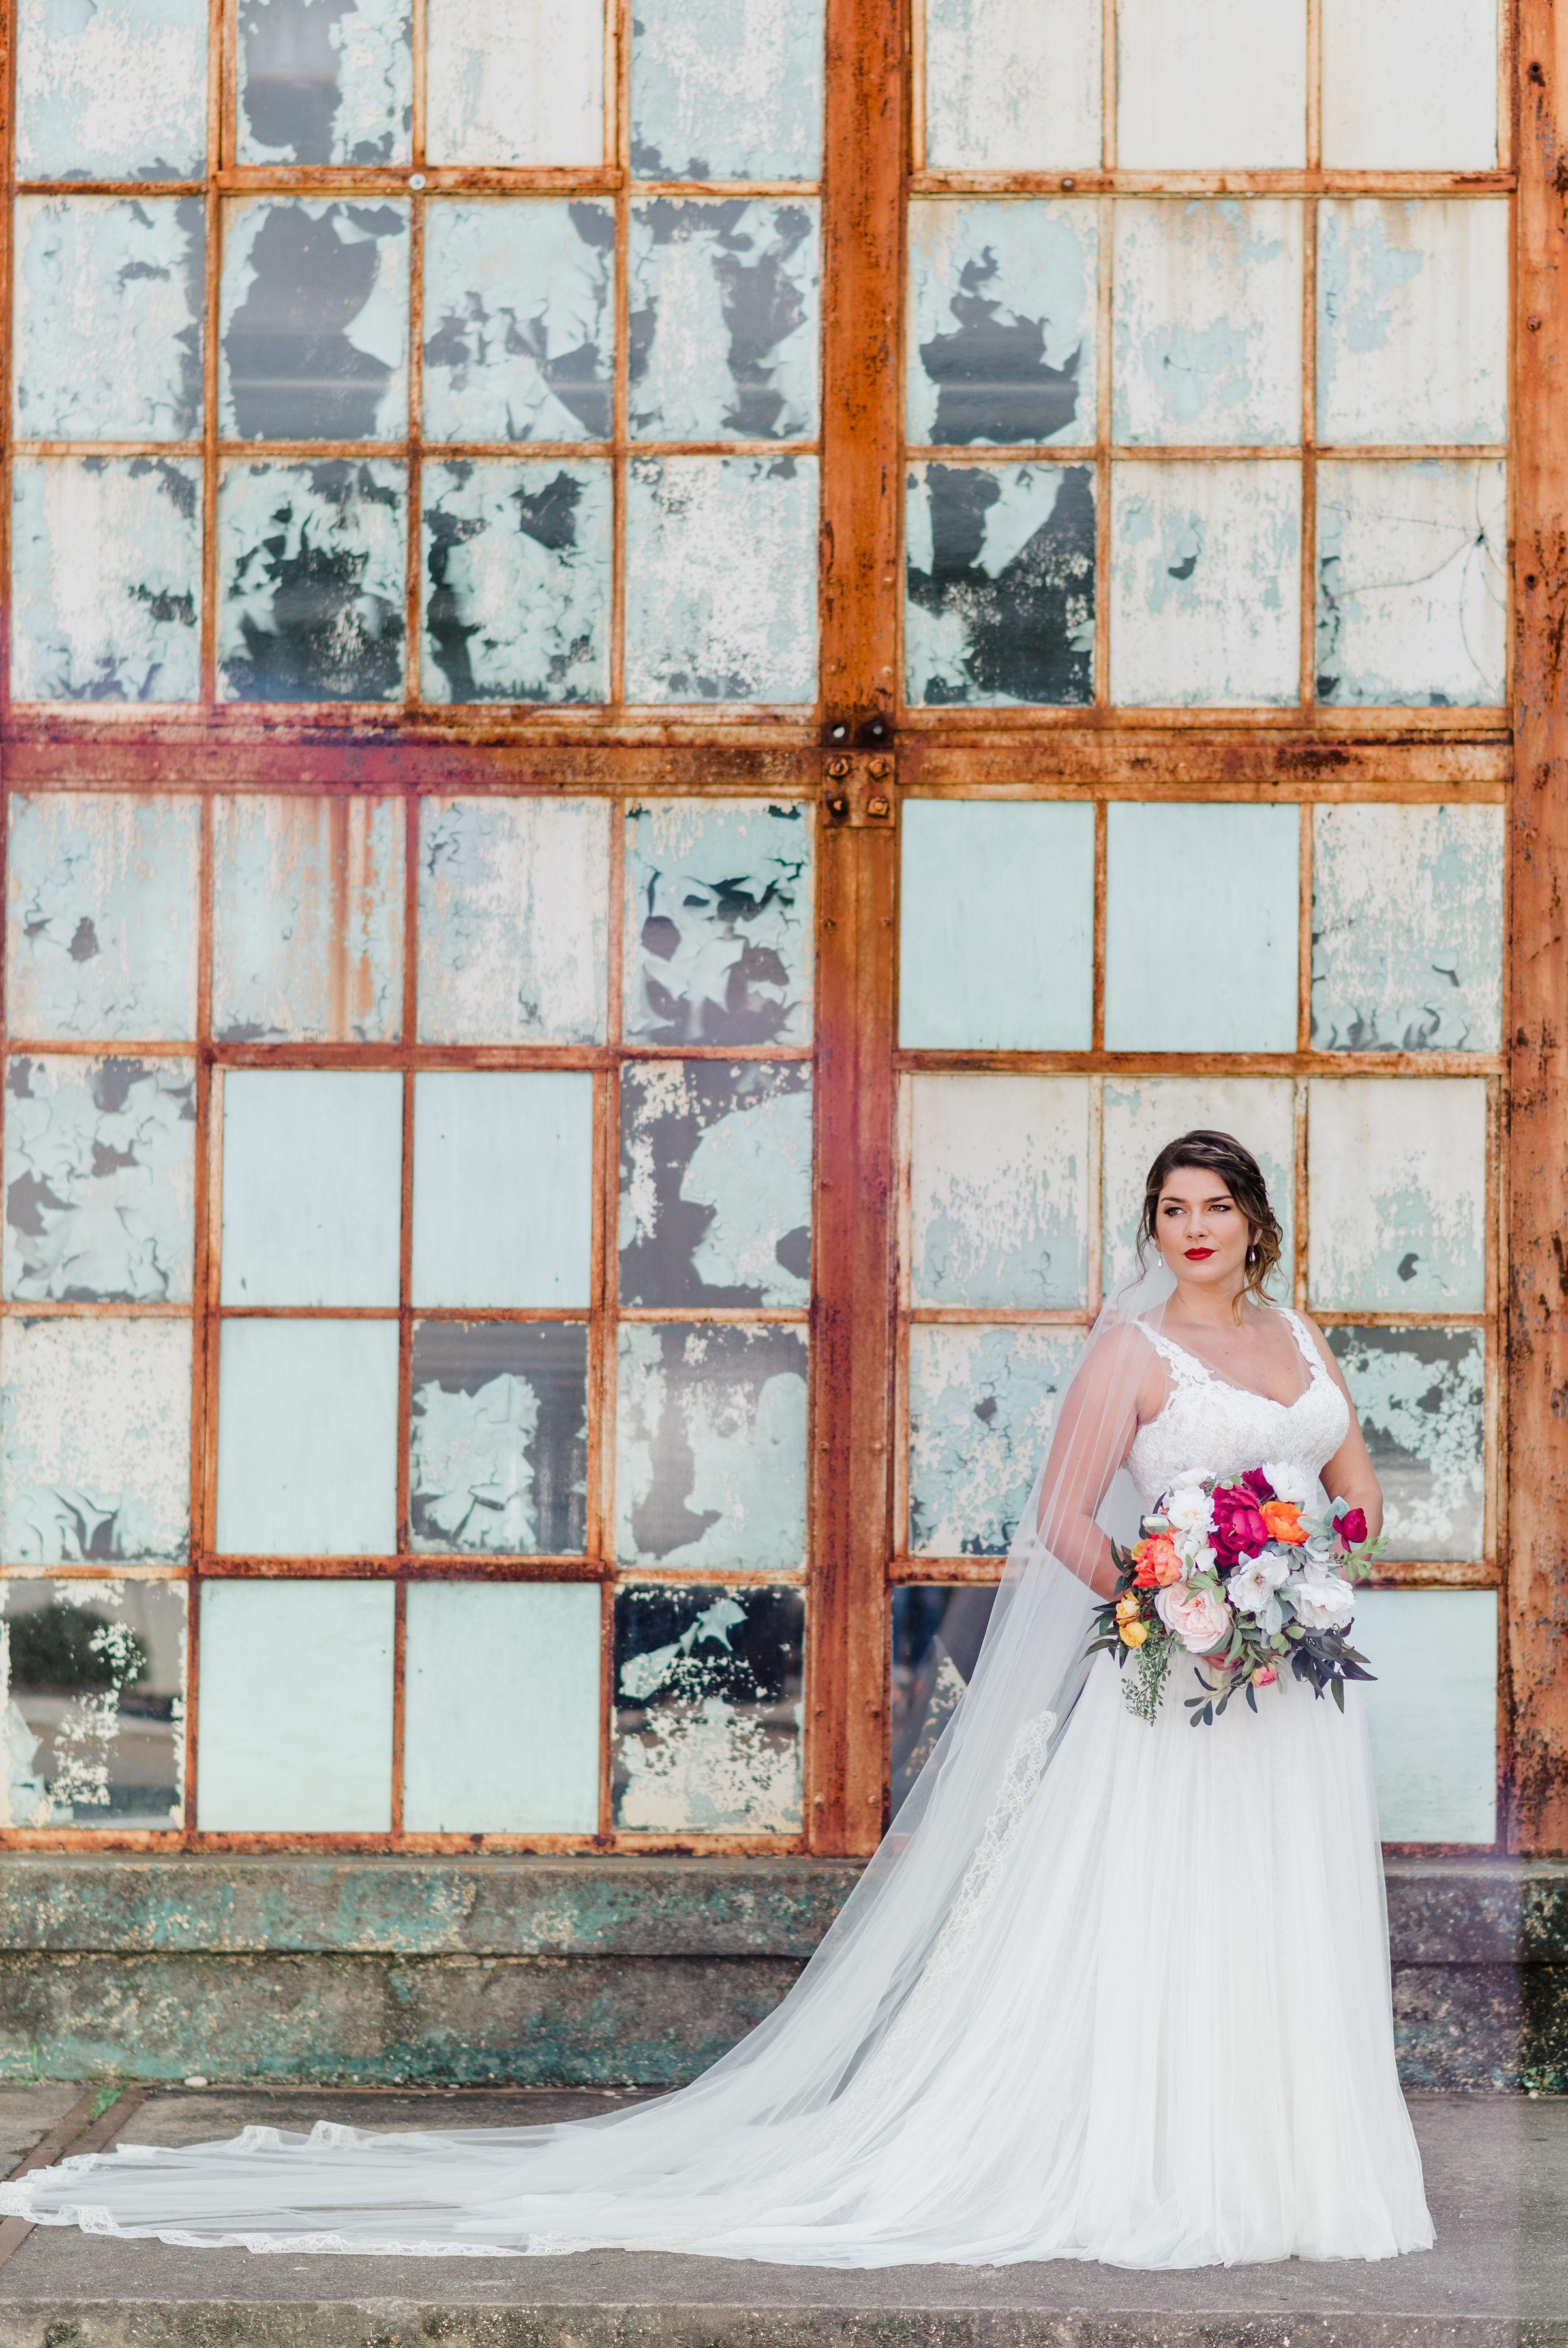 TaylorAdams_bridals-108.jpg